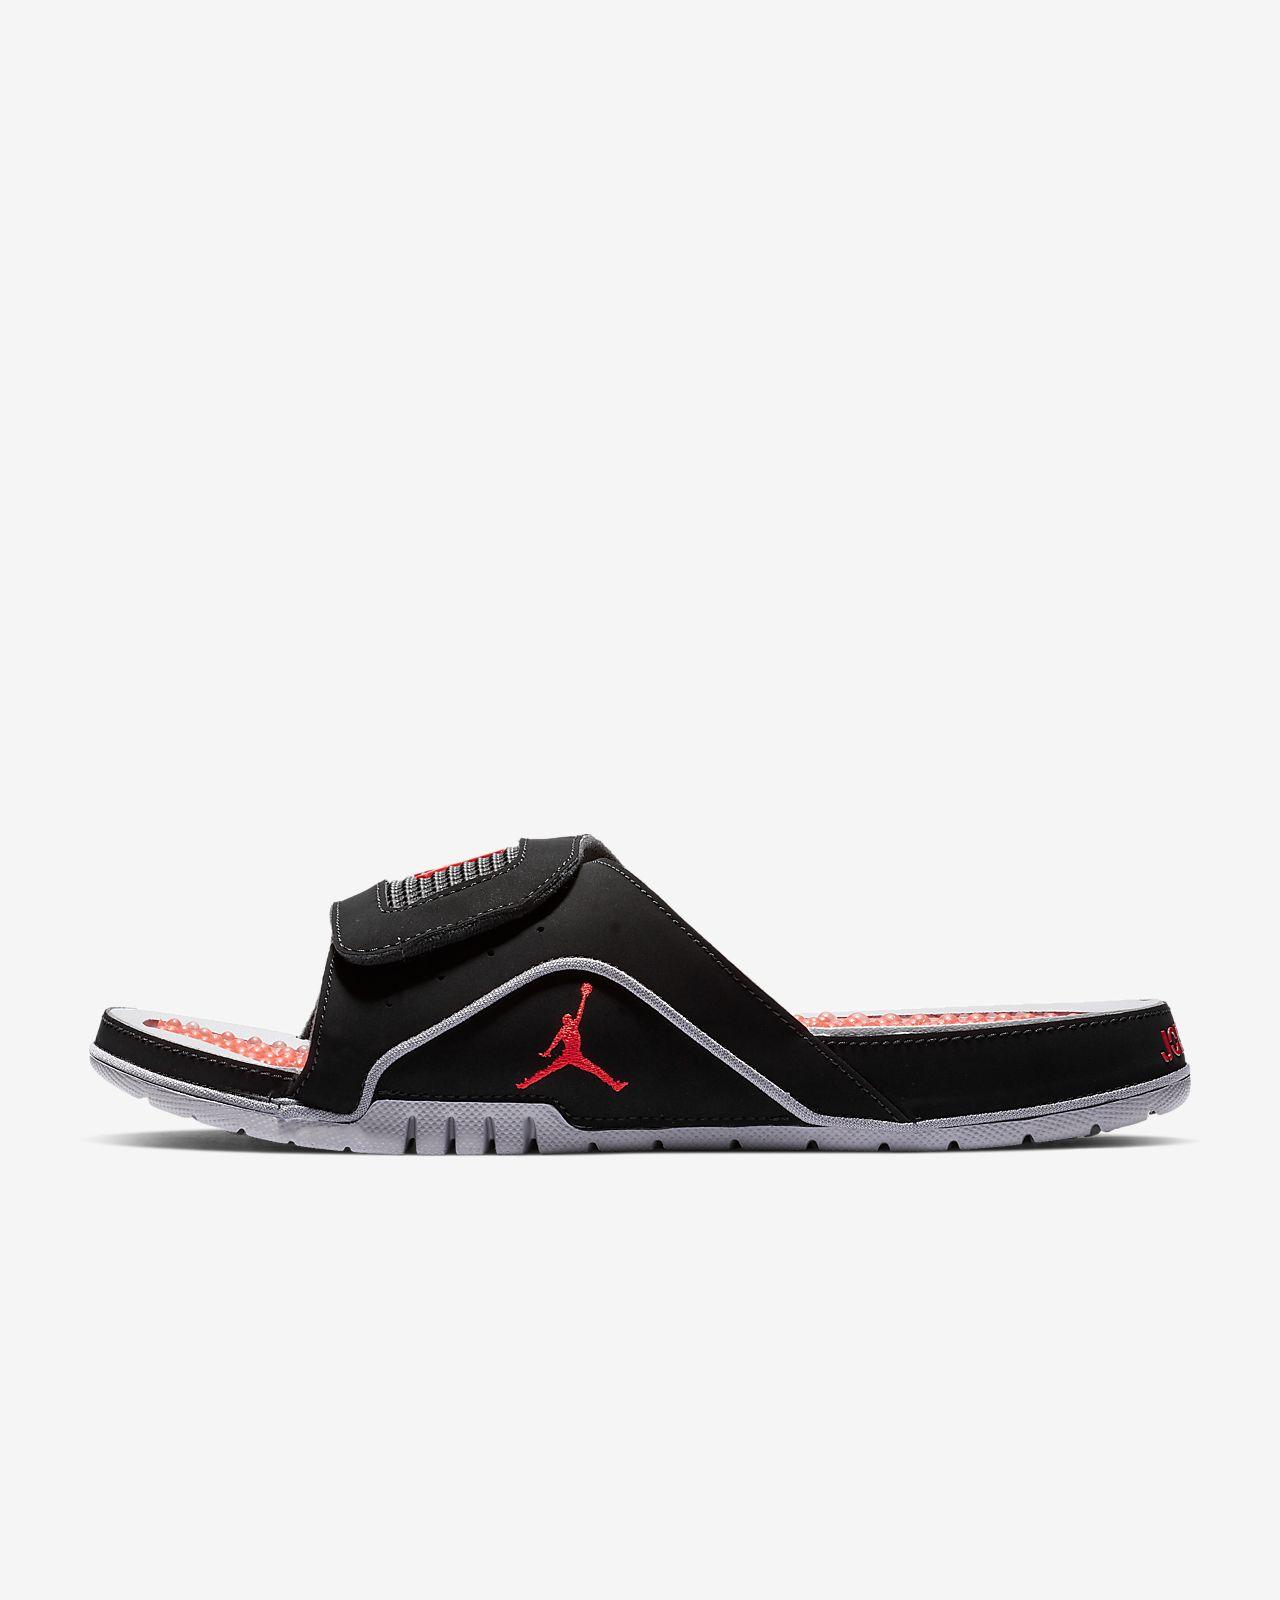 c3e658c0f4a Jordan Hydro 4 Retro Men's Slide. Nike.com